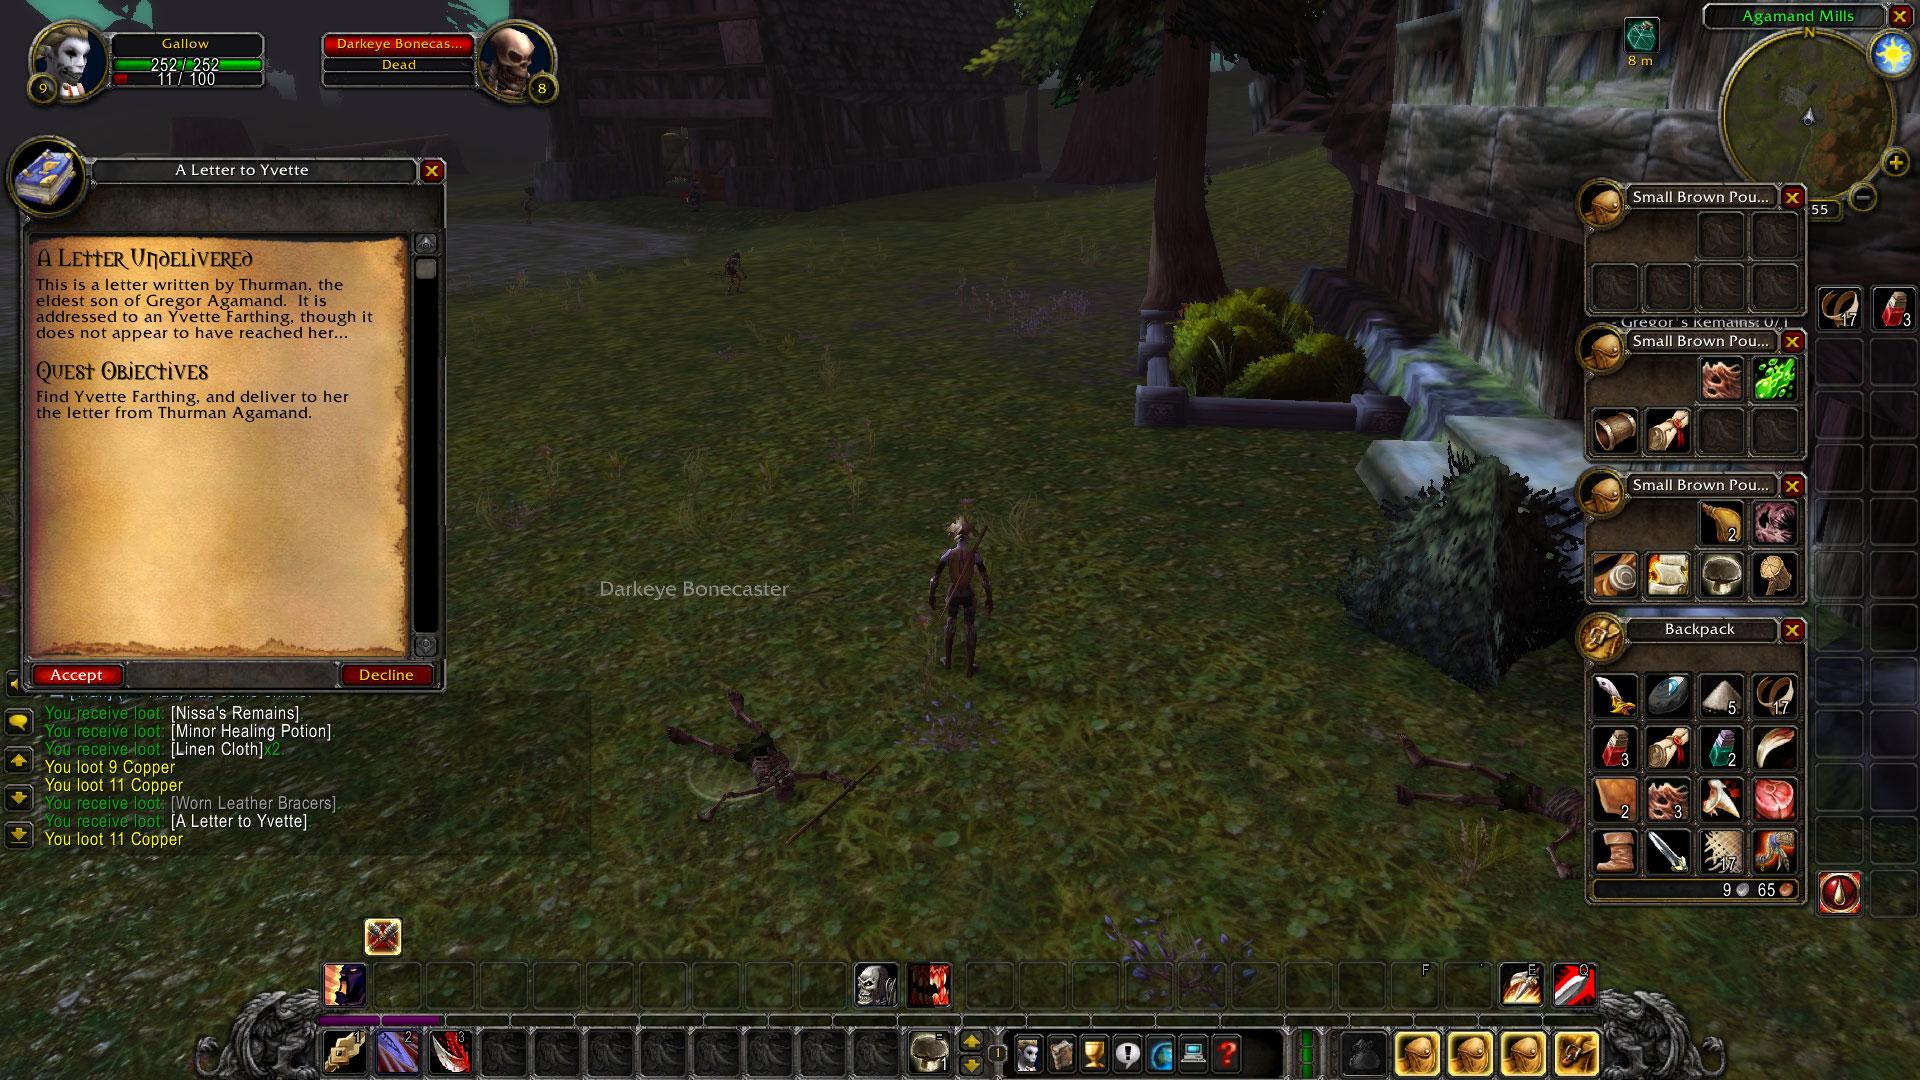 Adventures of Gallow the Forsaken Warrior • WoW Classic • Barrens Chat